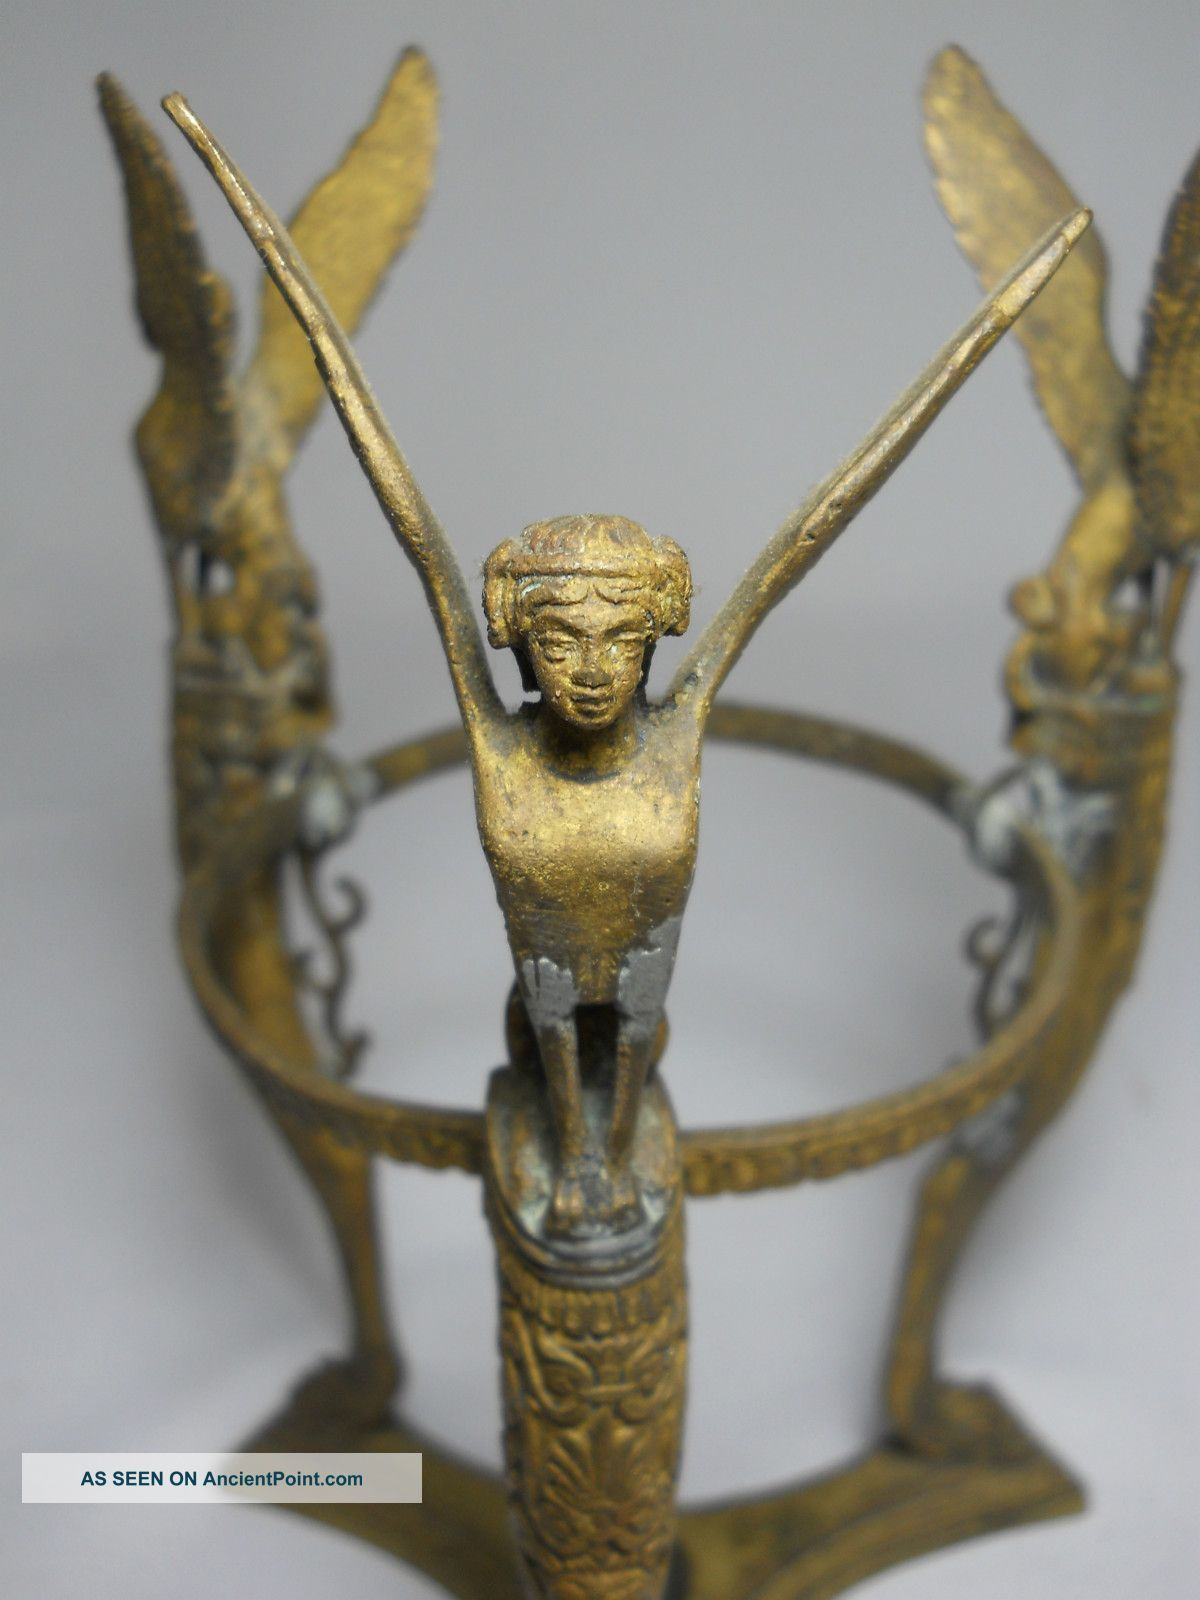 Unique ornate antique brass flying triple sphinx vase holder stand unique ornate antique brass flying triple sphinx vase holder stand victorian reviewsmspy